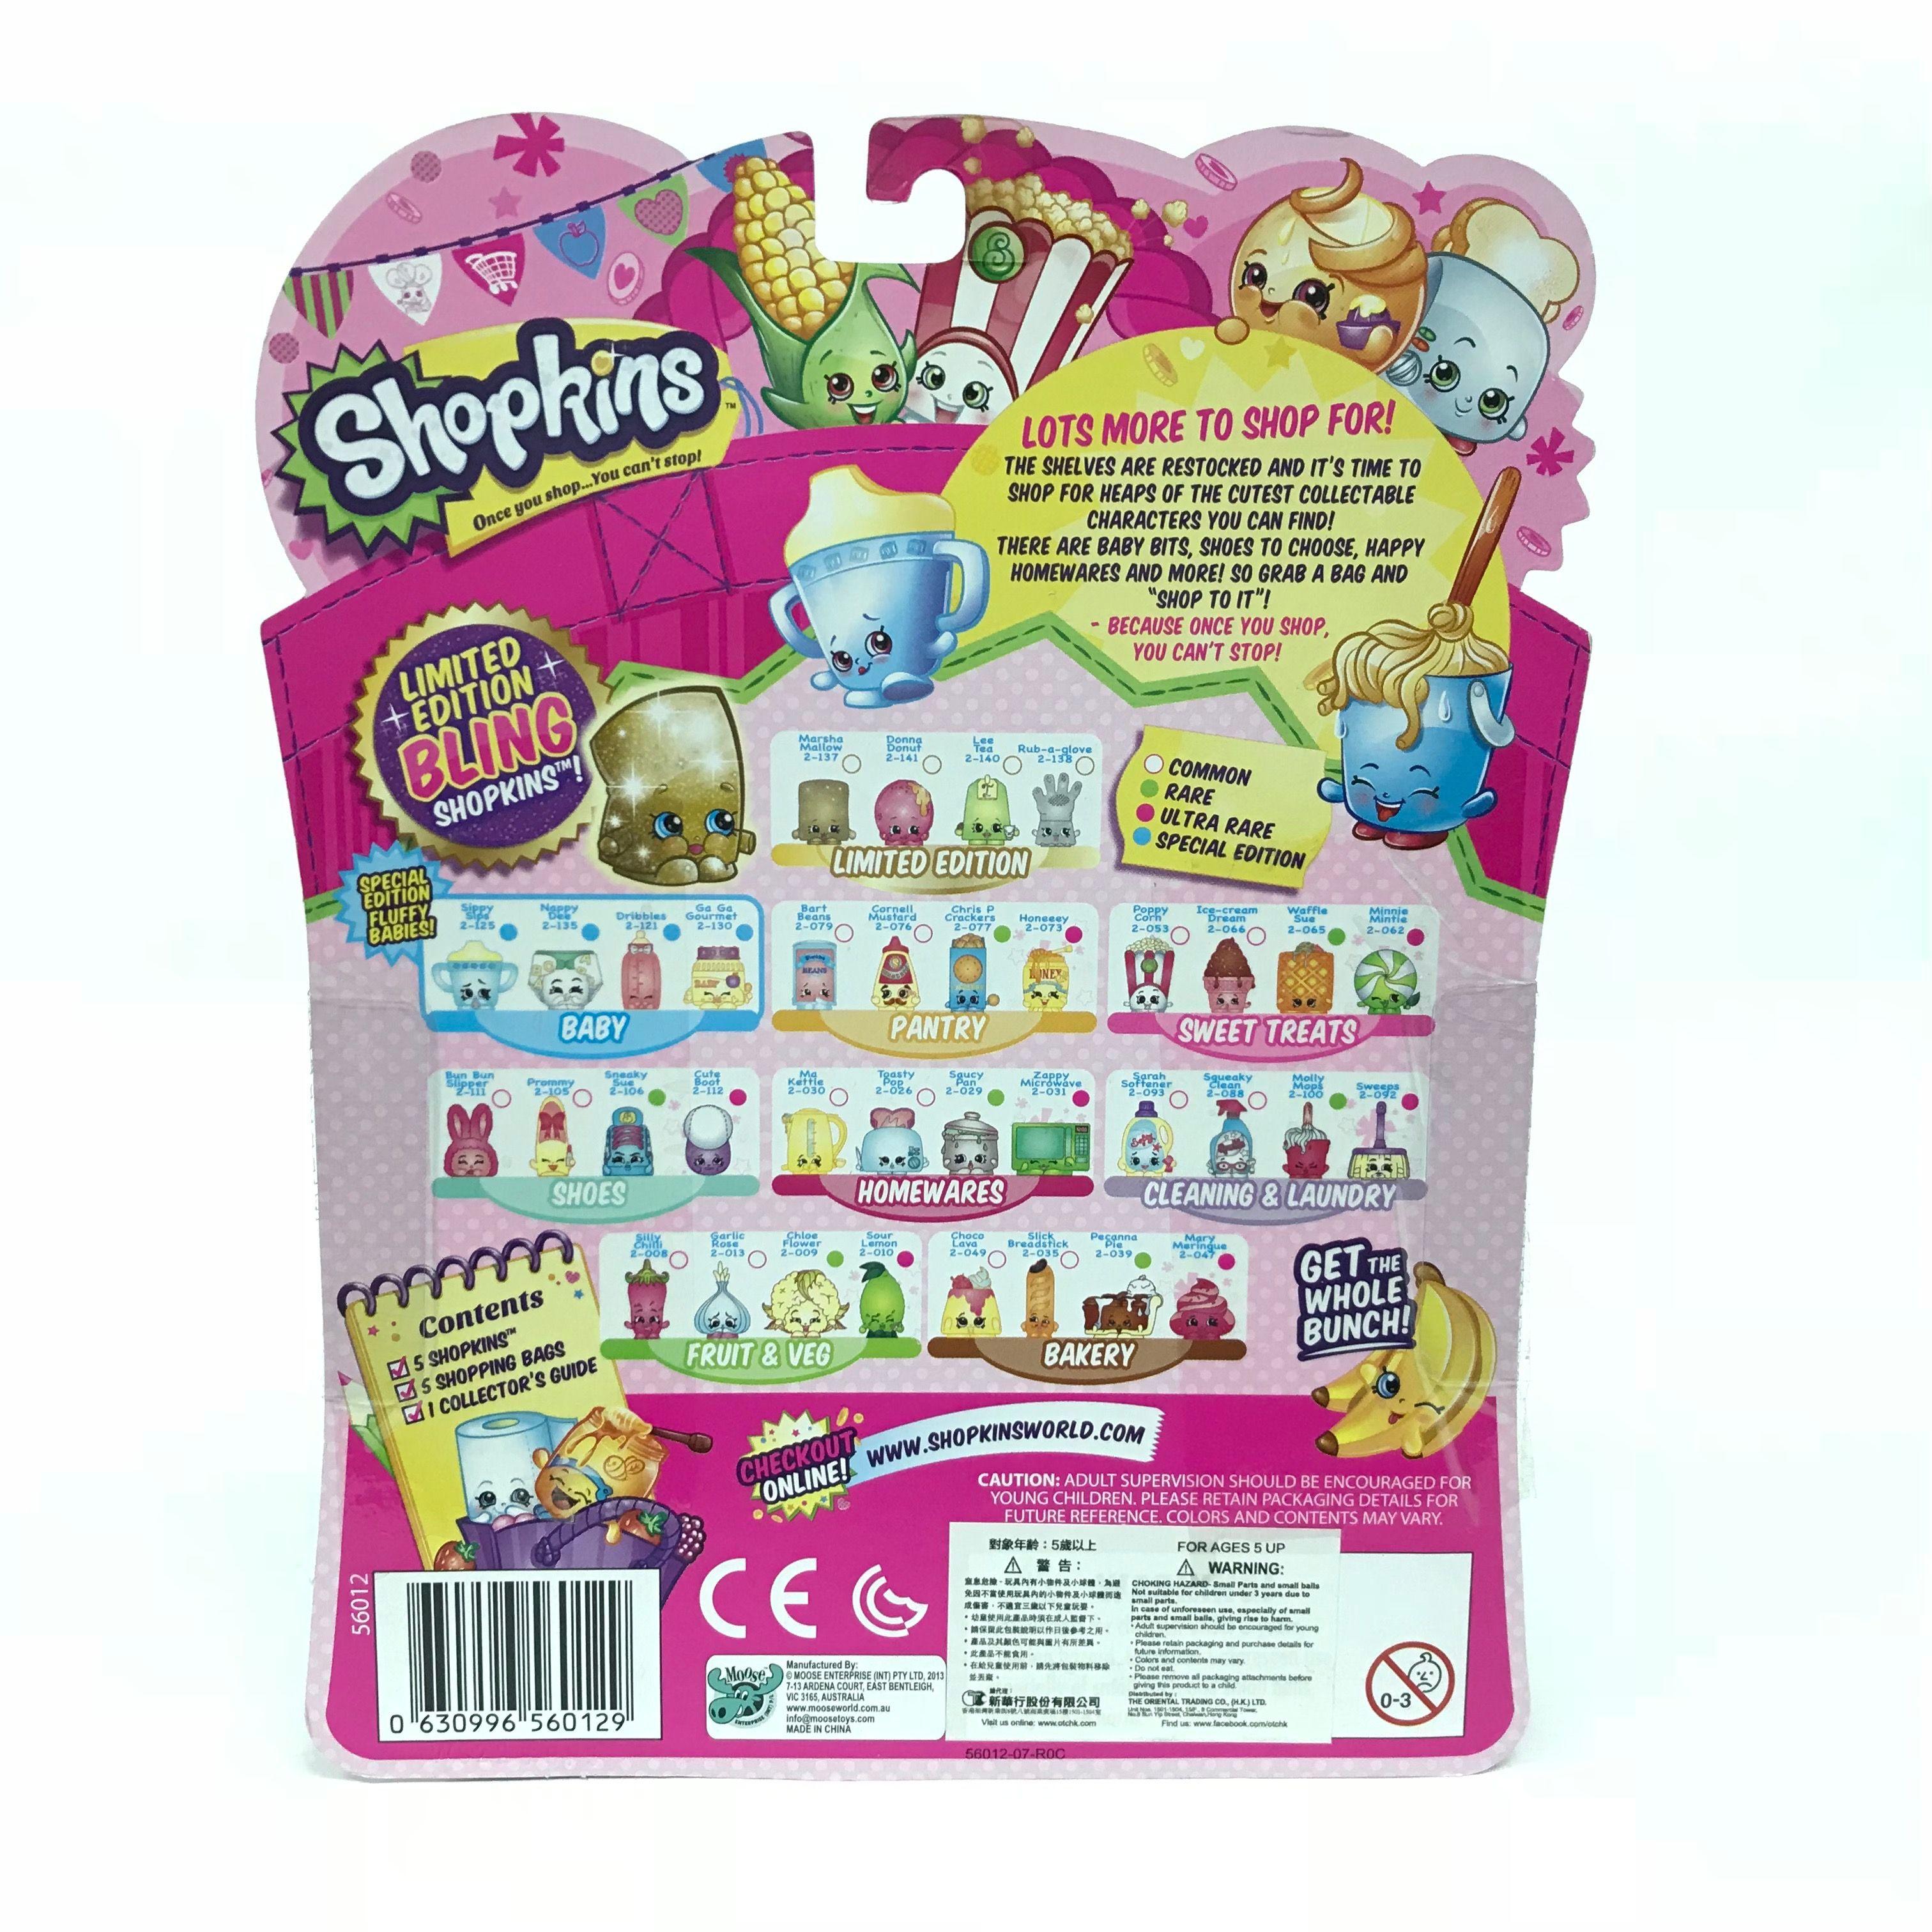 Shopkins-Season-2-Collectibles-Pack-of-5-Bags-Characters-Set thumbnail 9